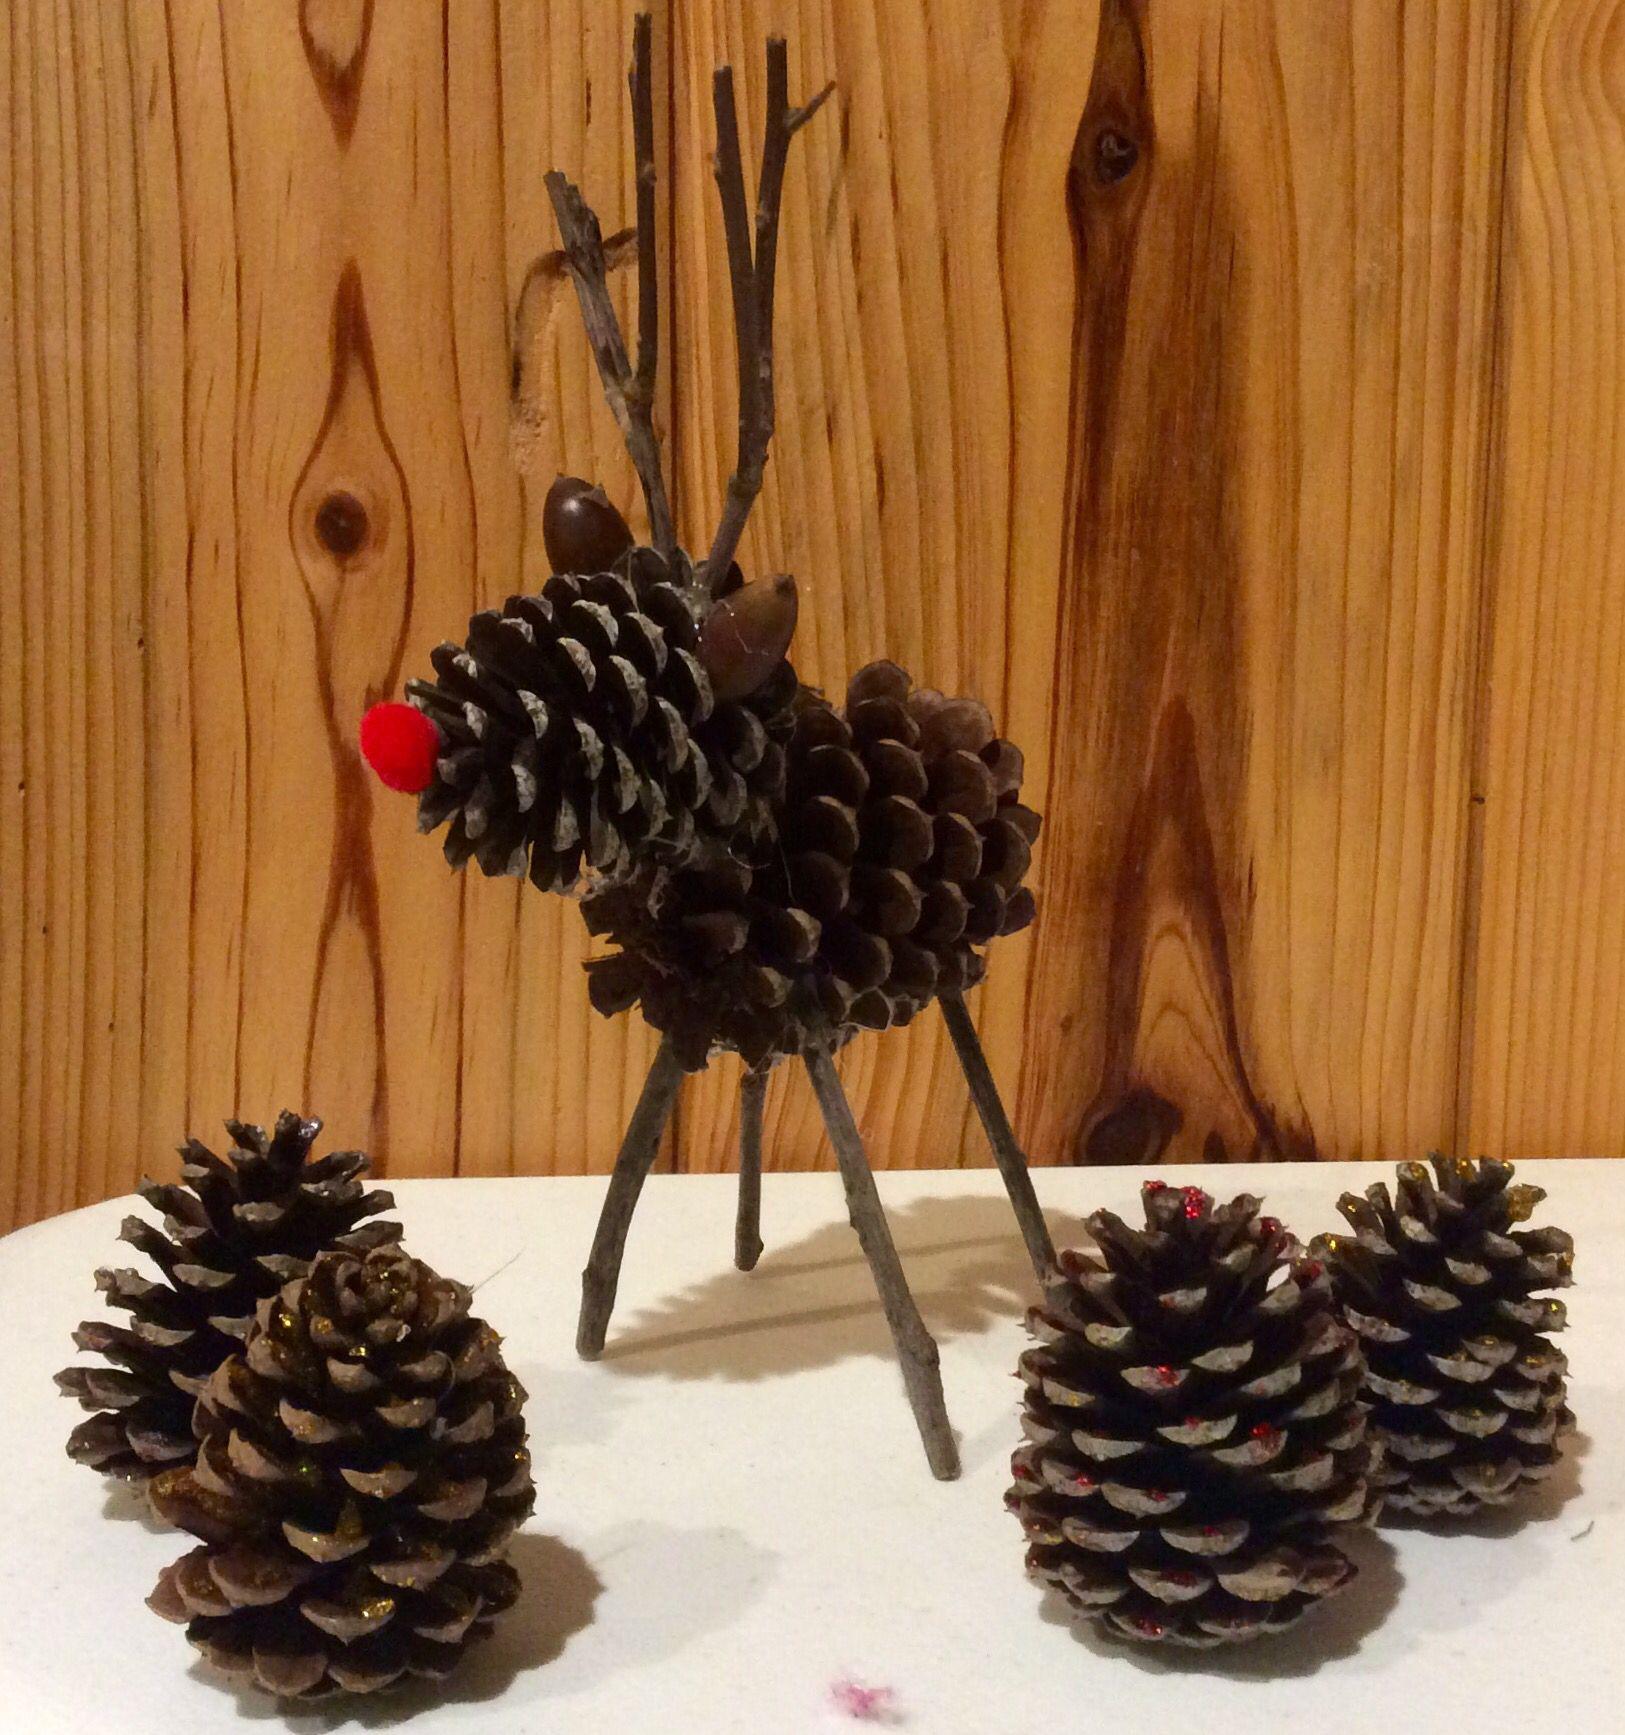 pinecone reindeer pine cones pine cone crafts reindeer craft christmas crafts. Black Bedroom Furniture Sets. Home Design Ideas